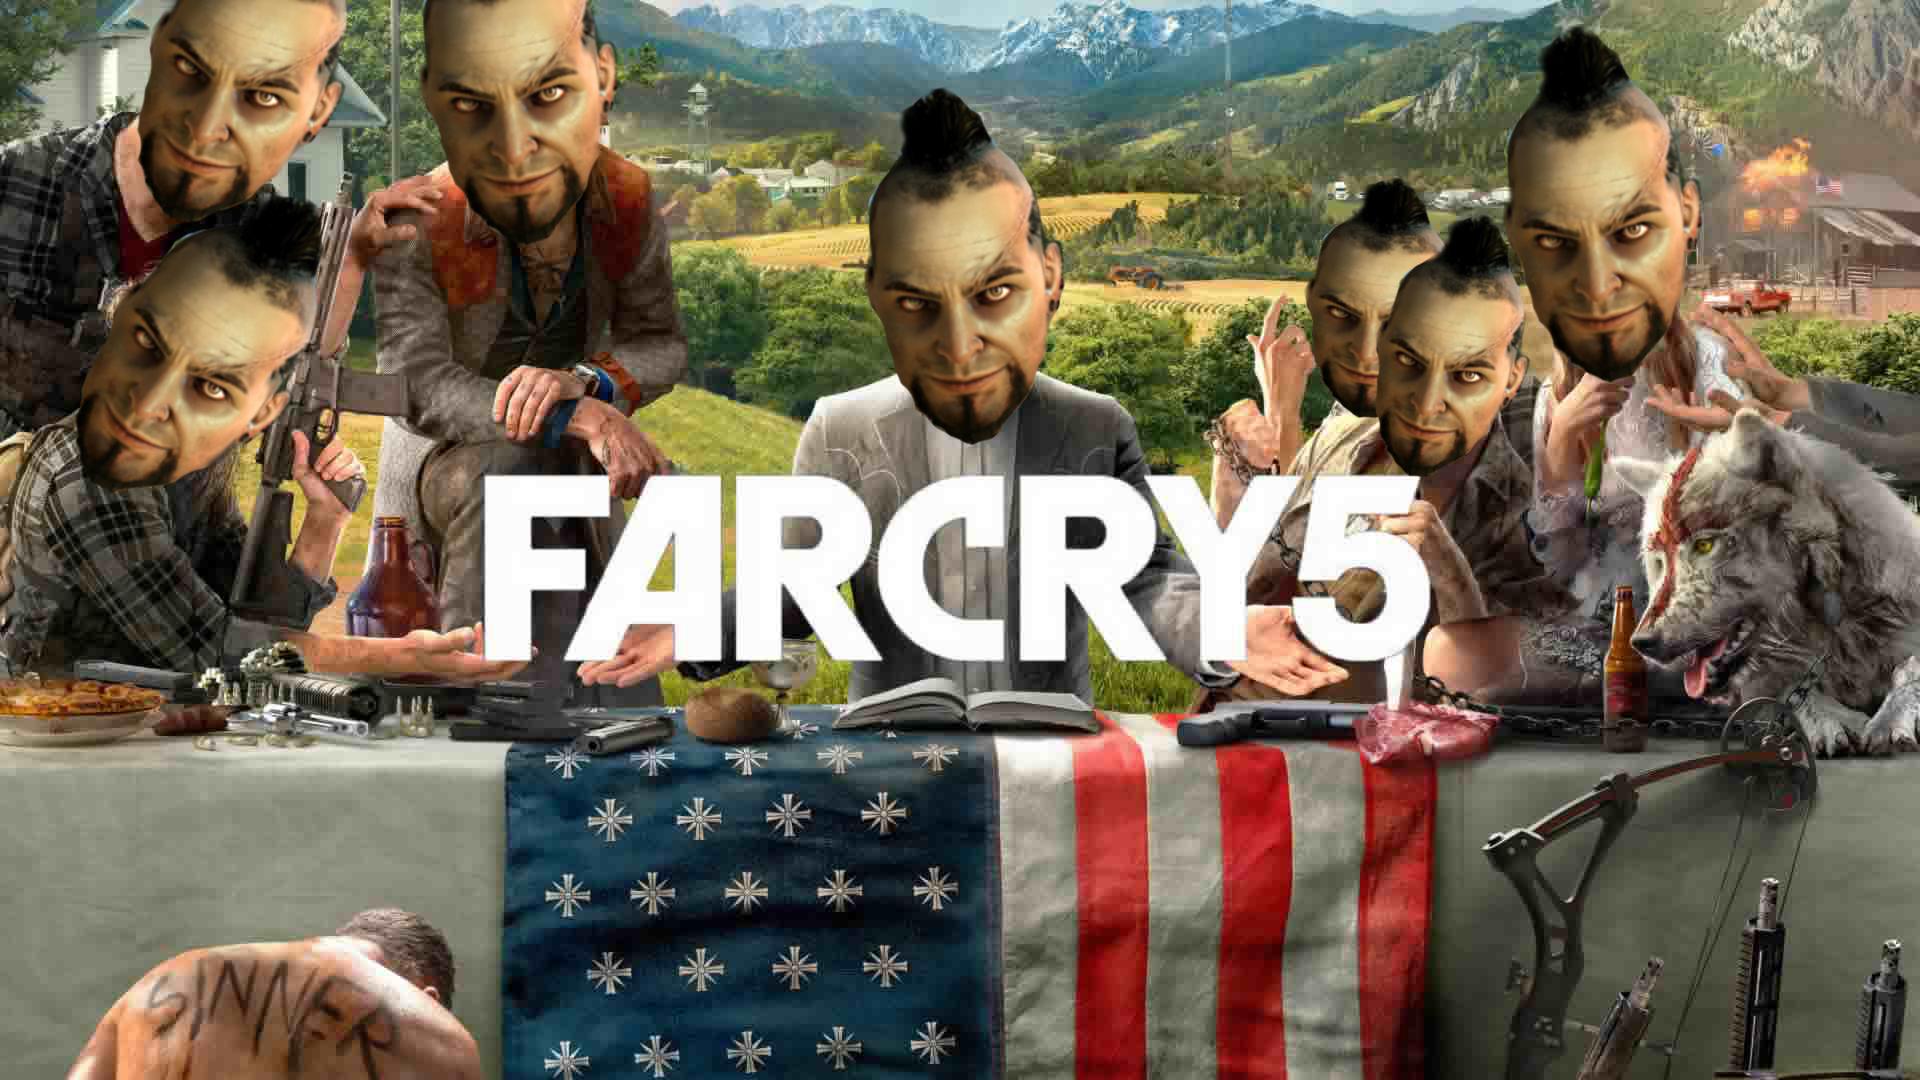 Far Cry 5 Season Pass contains a special surprise